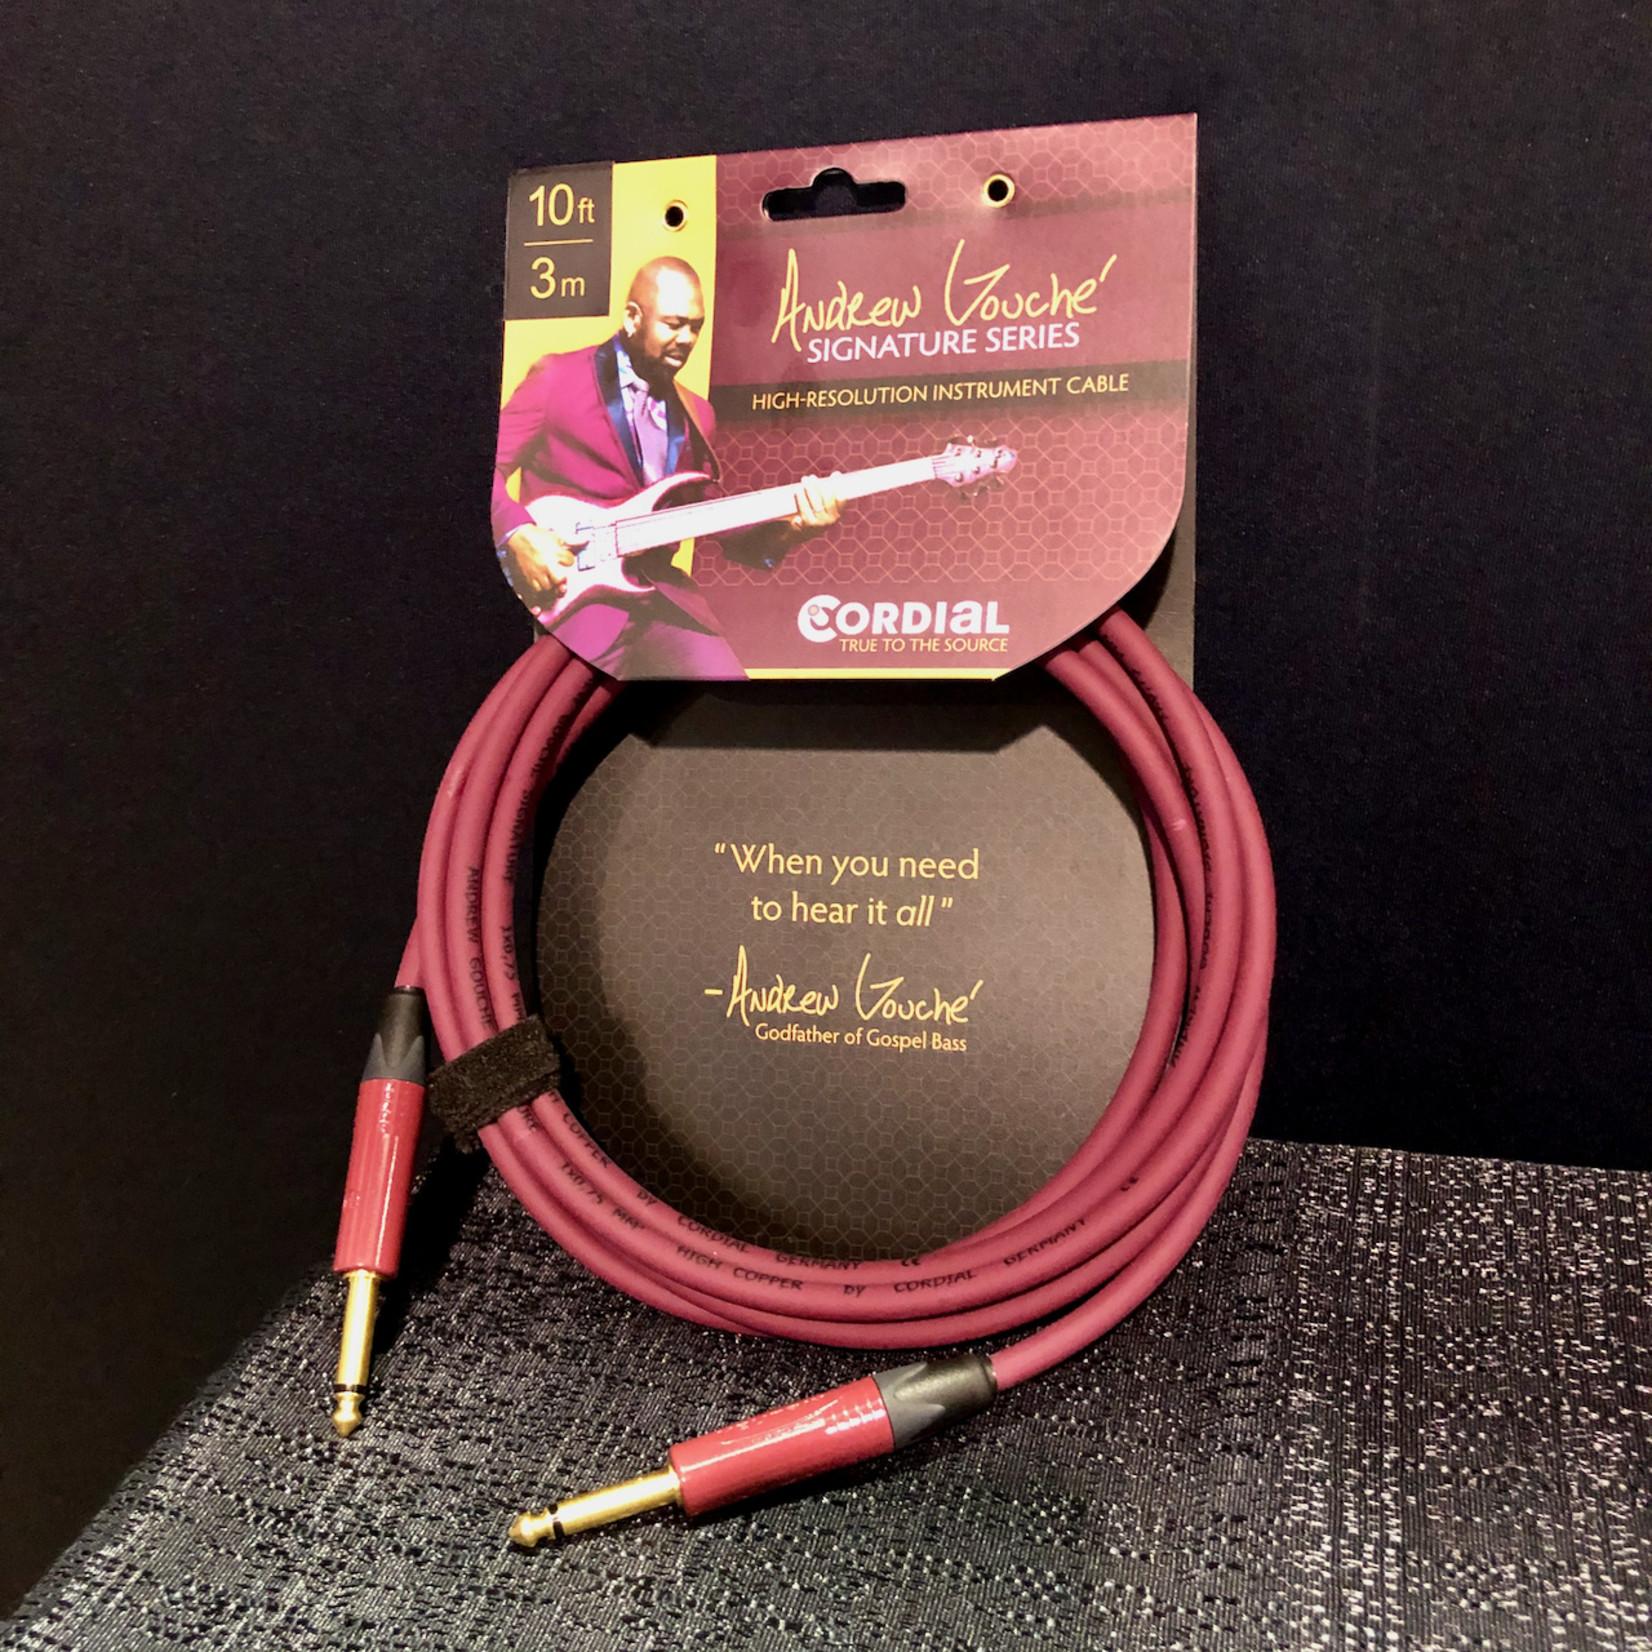 Cordial Cables Cordial CSI 3 PP-Andrew Gouché Signature 10-ft/3m High Resolution Instrument Cable w/ Neutrik Plugs